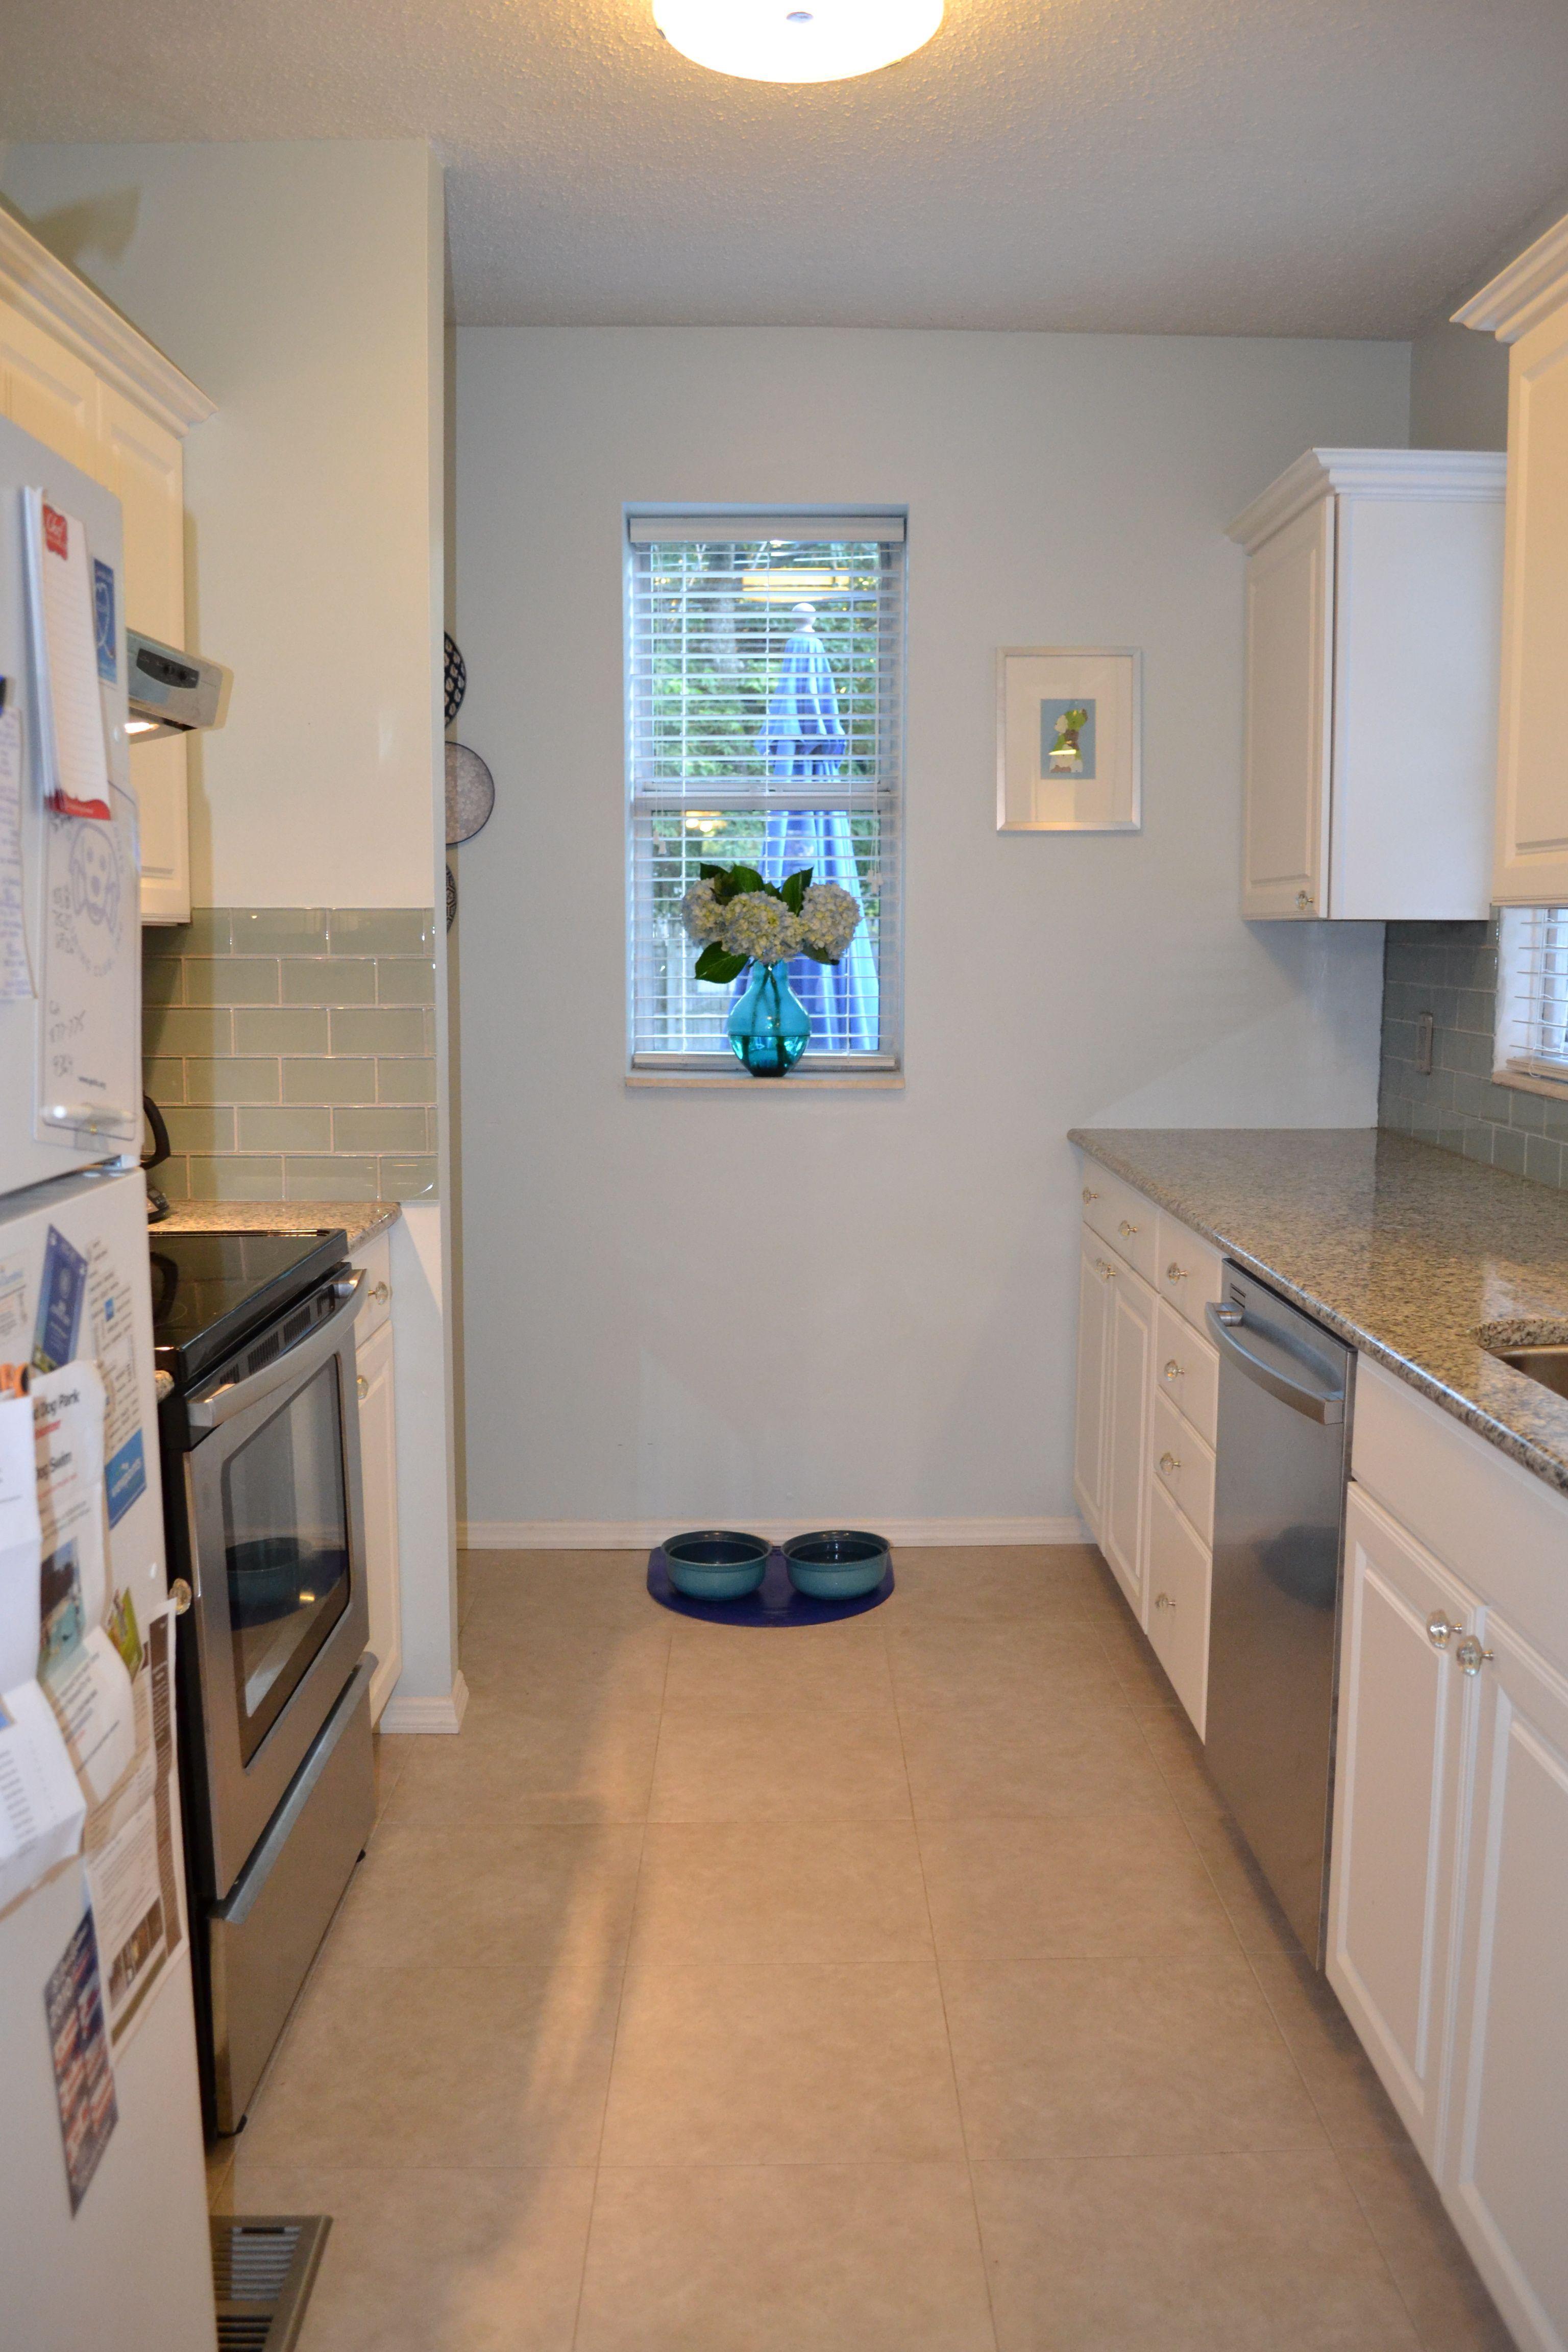 Blue Floor Tiles Kitchen Ivory Cabinets Black Countertops Gray Floor Slate Blue Wall